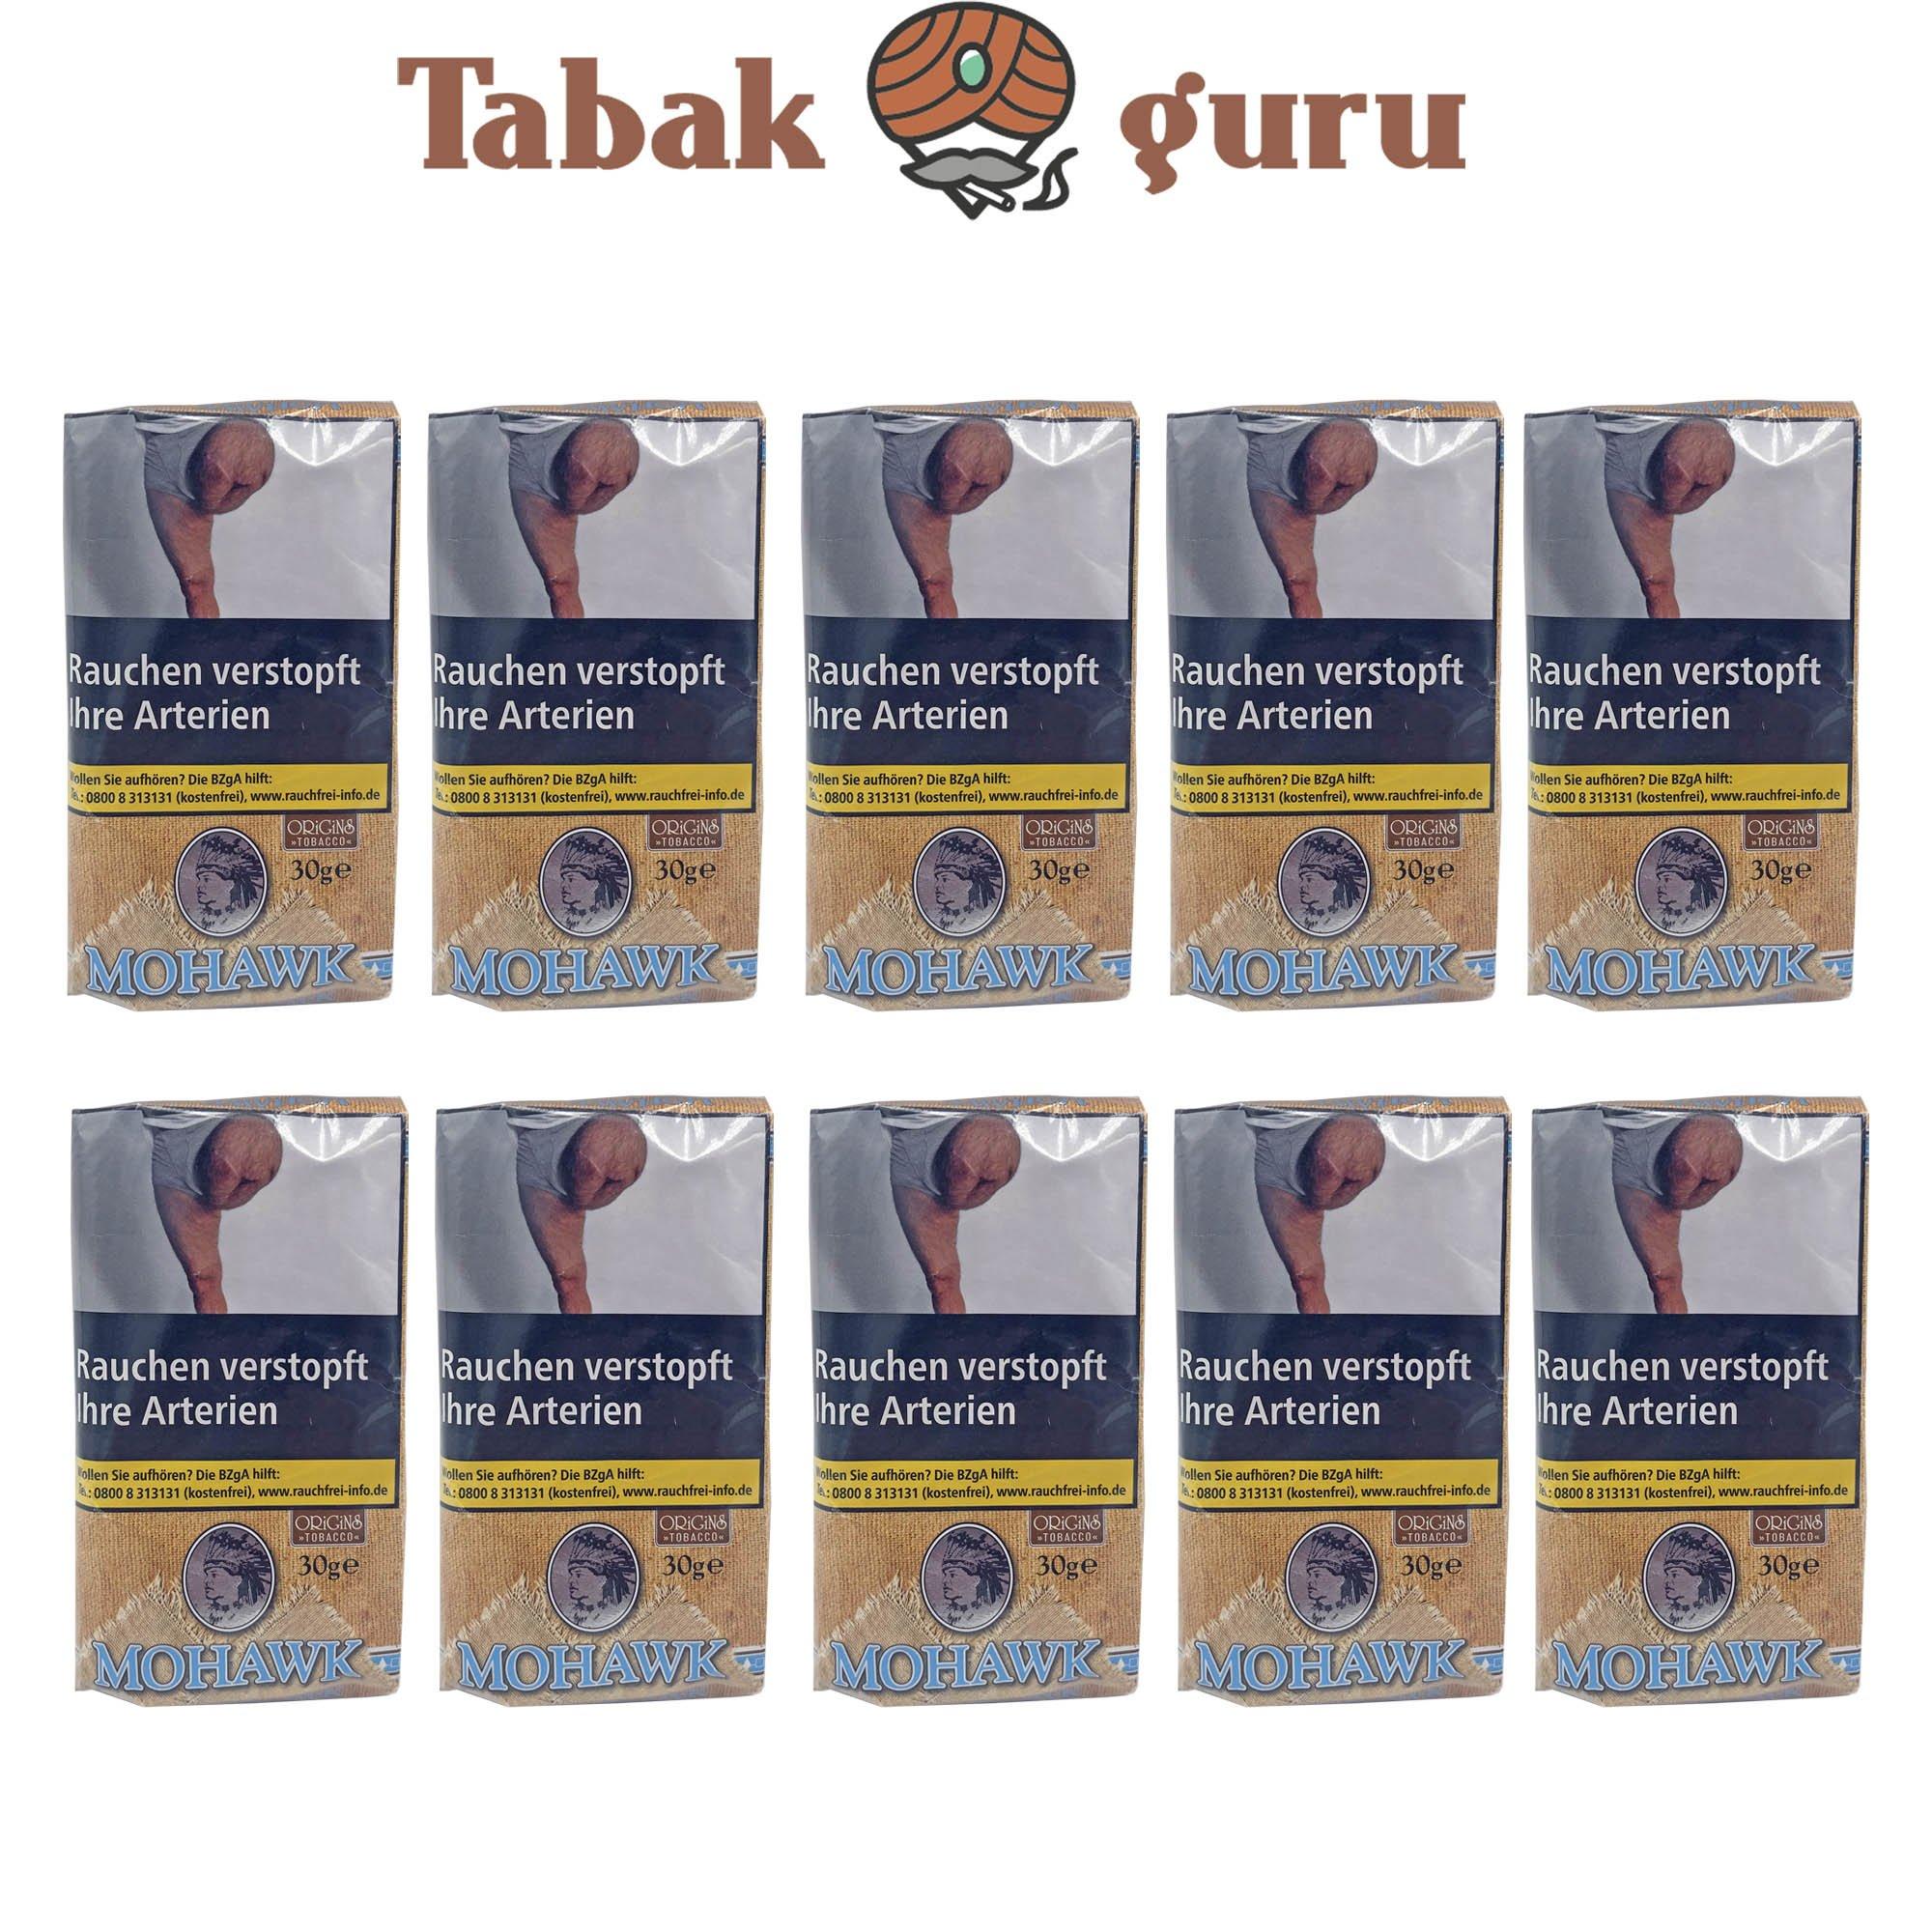 10 x Mohawk Origins Tobacco 30g Drehtabak Zigarettentabak